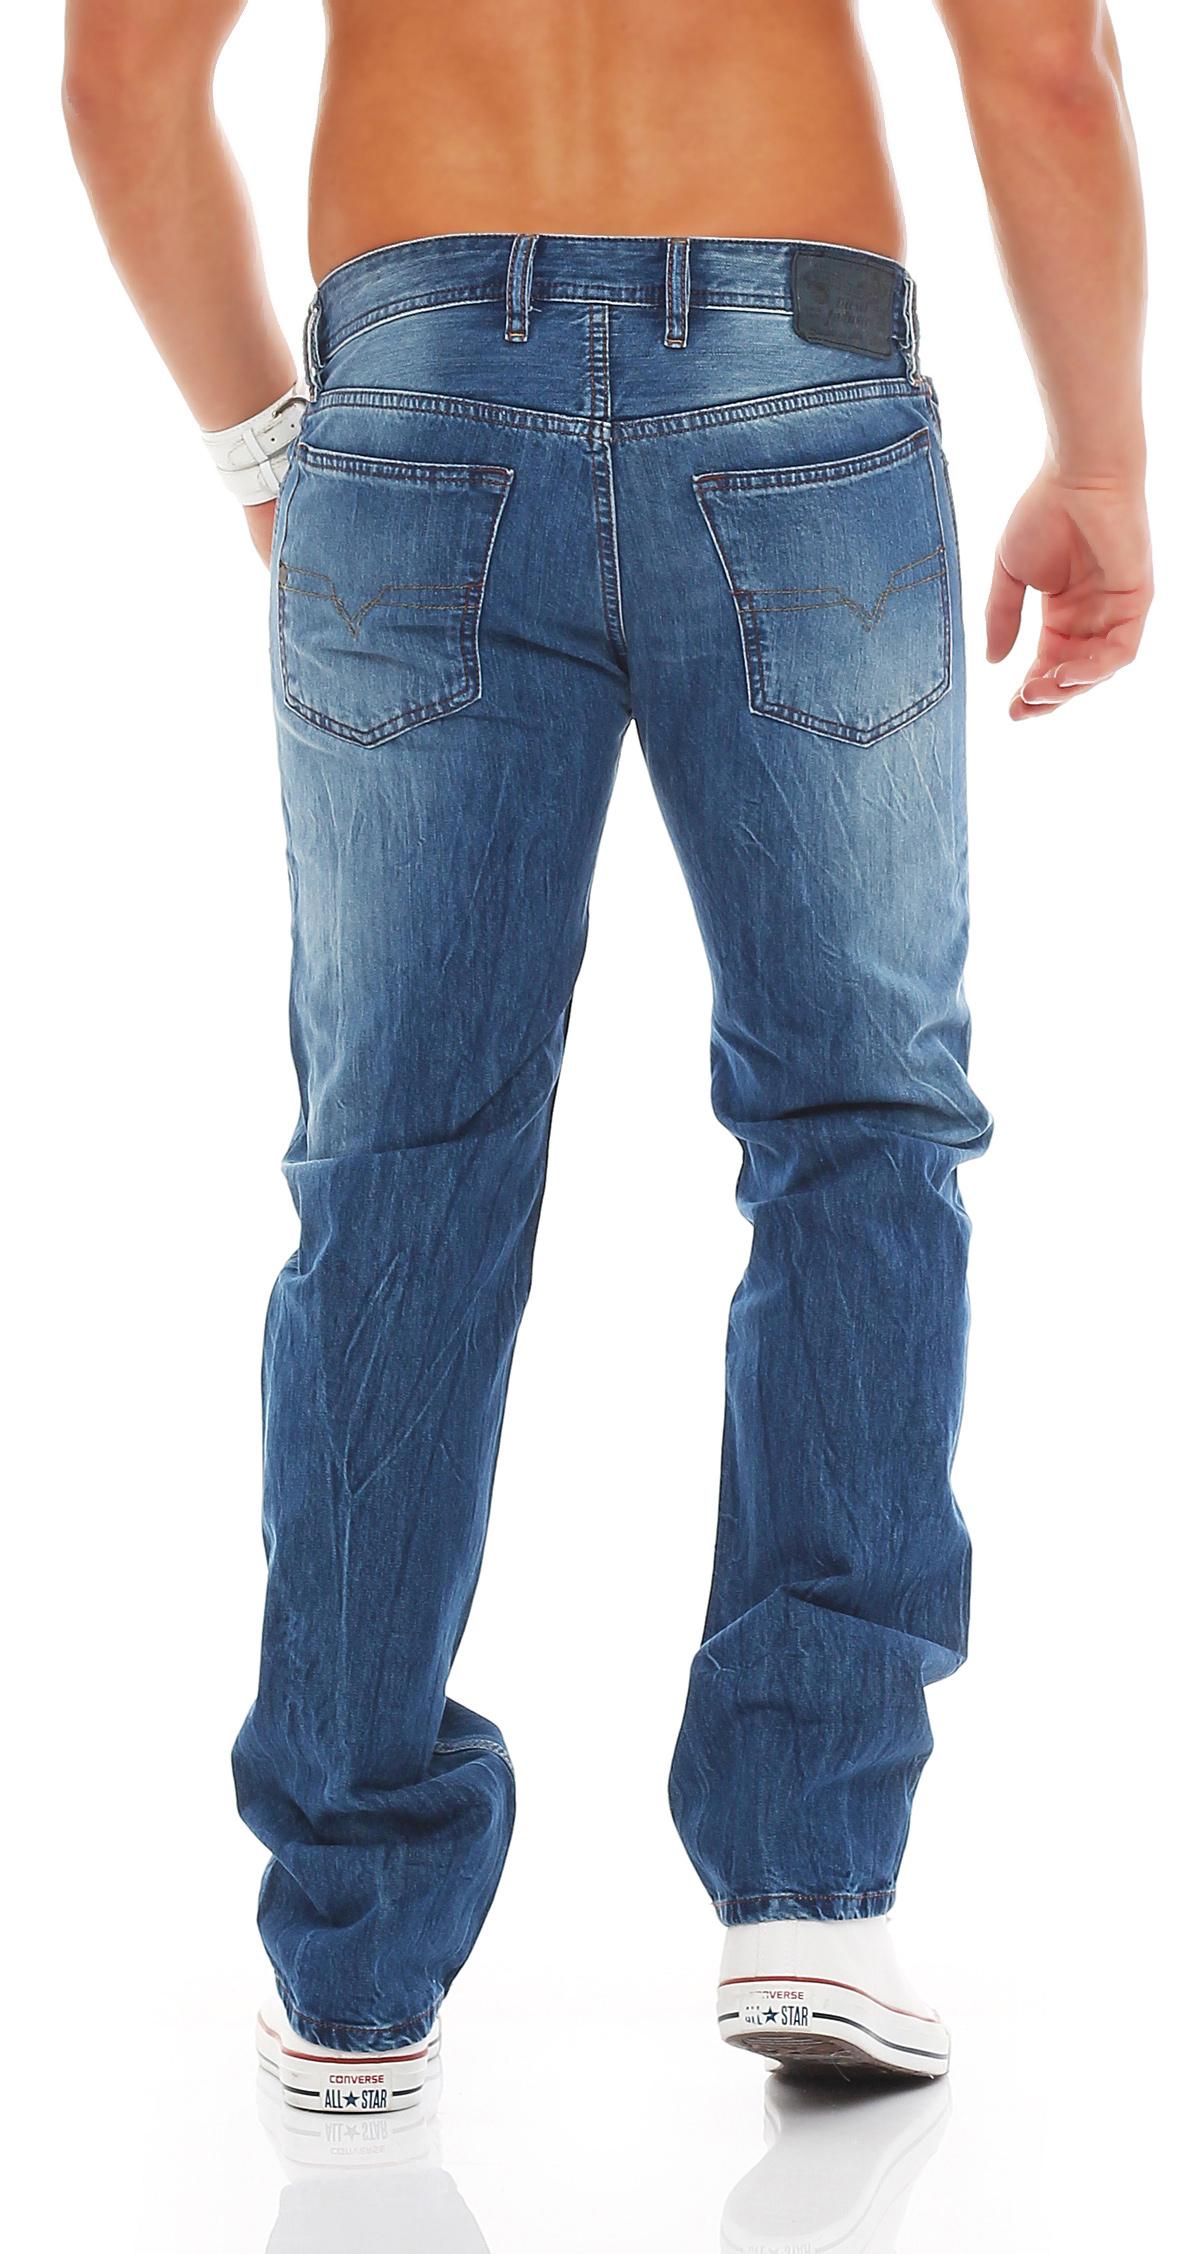 diesel jeans waykee 0rbrt brt homme coupe droite regular. Black Bedroom Furniture Sets. Home Design Ideas